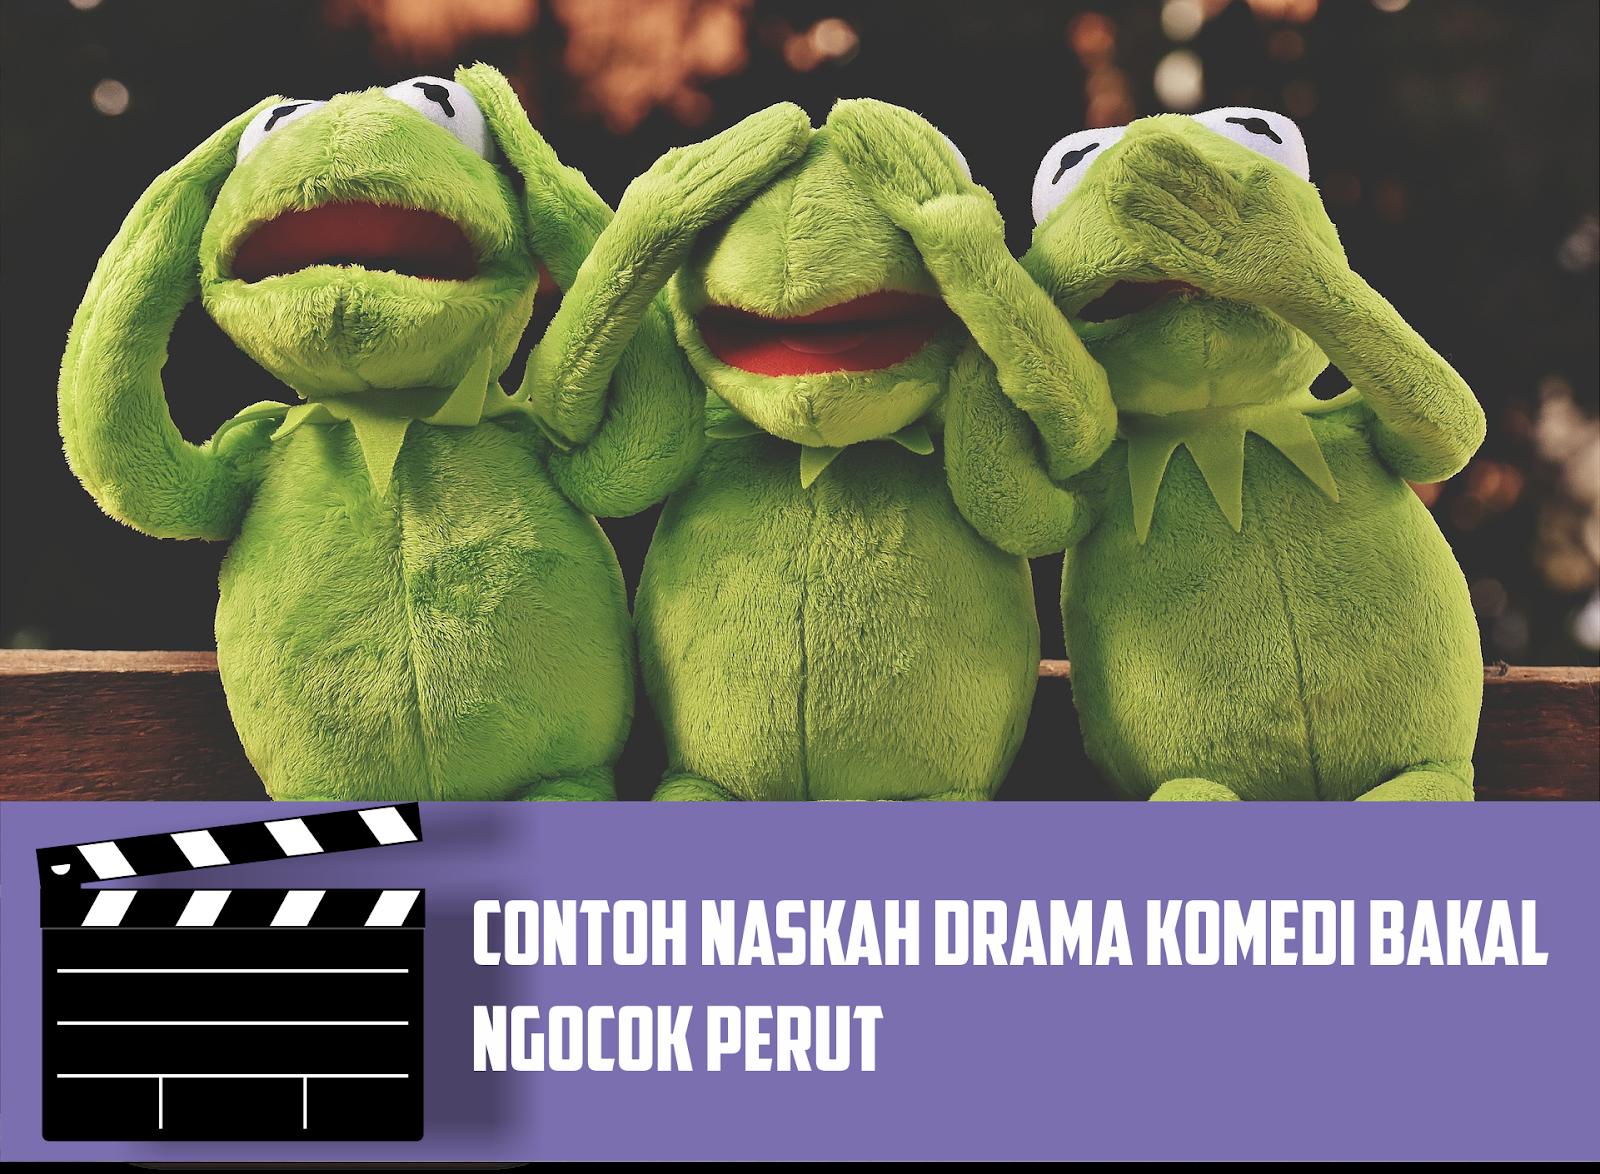 Contoh Teks Drama Komedi Singkat 5 Orangutanger Yang